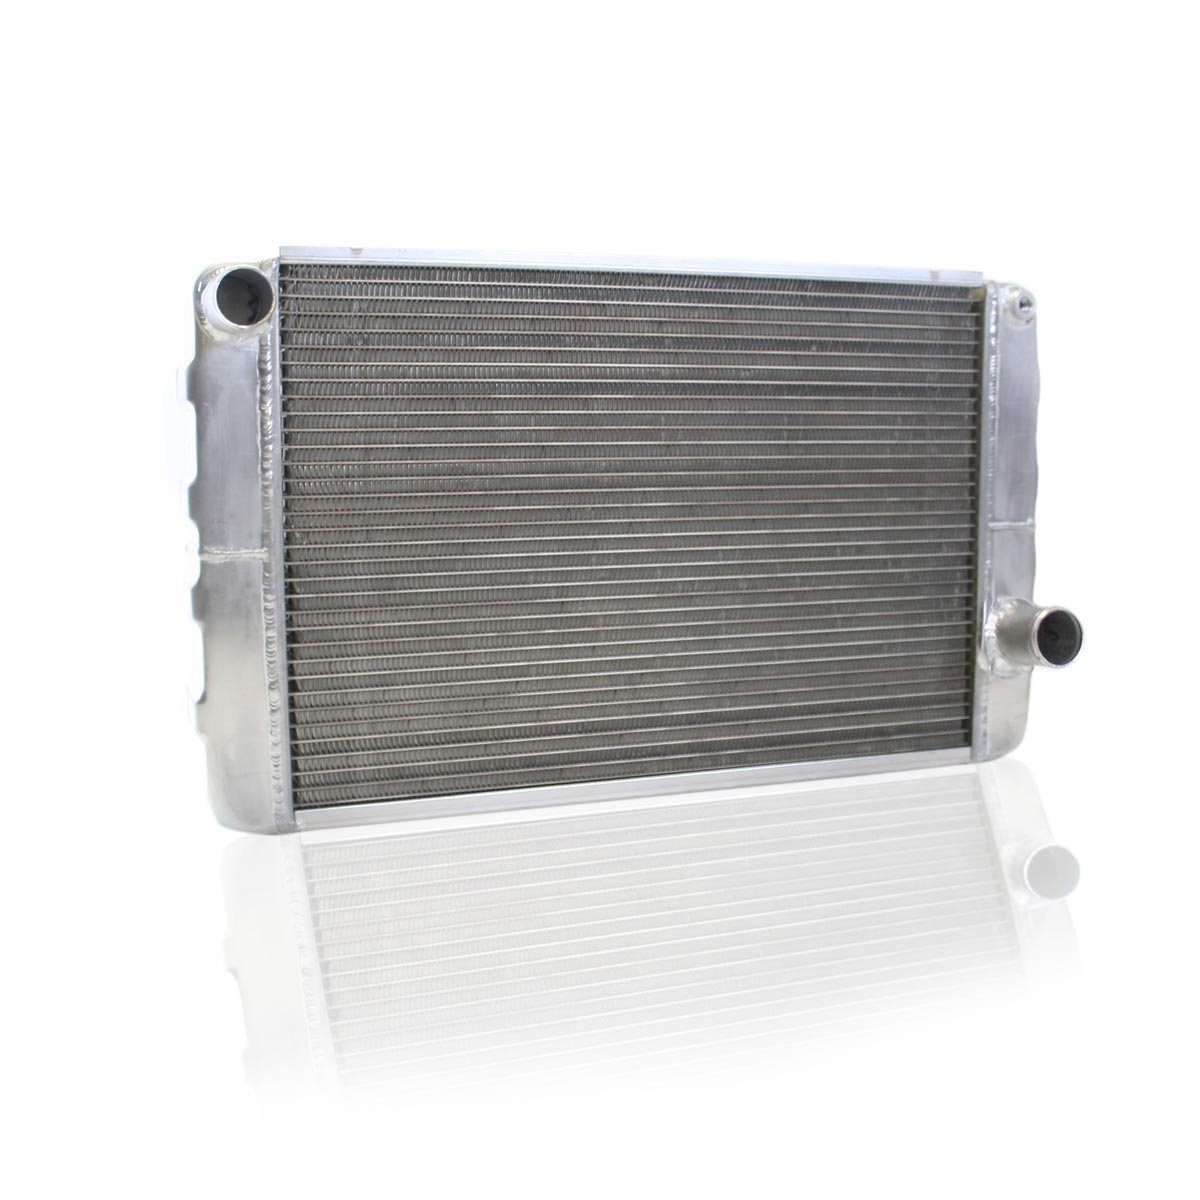 Griffin Radiator 1-25272-X ClassicCool 31 x 19 2-Row Universal Fit Cross Flow Radiator with 1 Tube